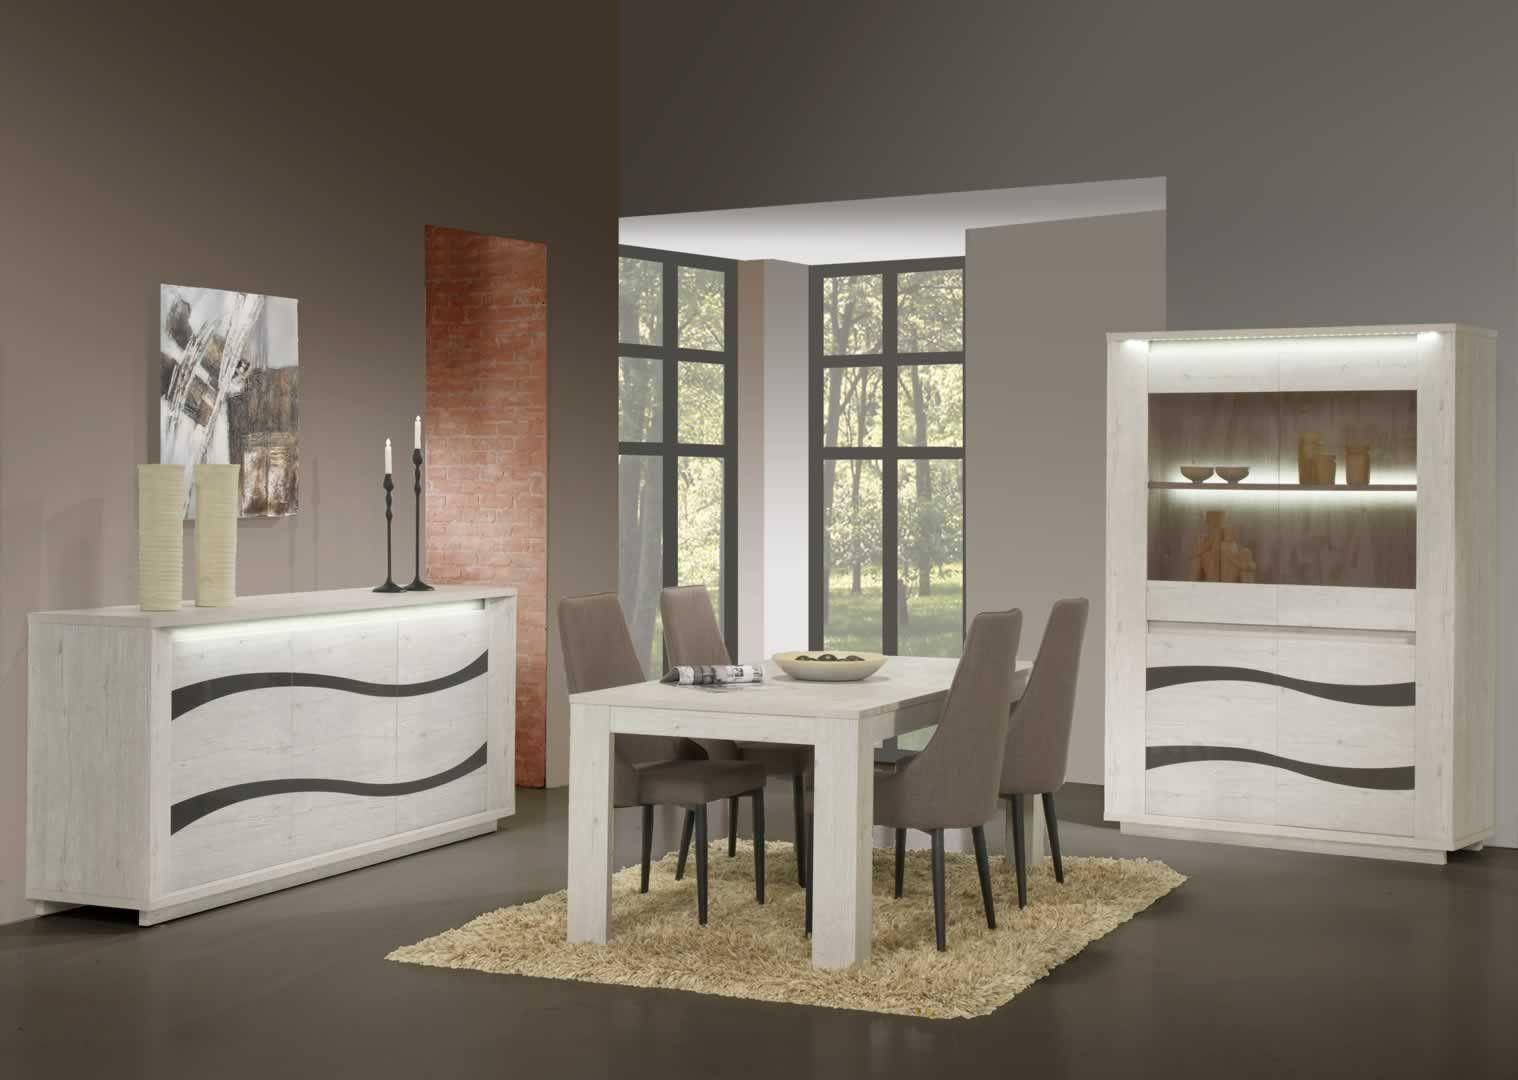 salle manger contemporaine salle manger clairage led buffet vitrine table 160 cm douai. Black Bedroom Furniture Sets. Home Design Ideas